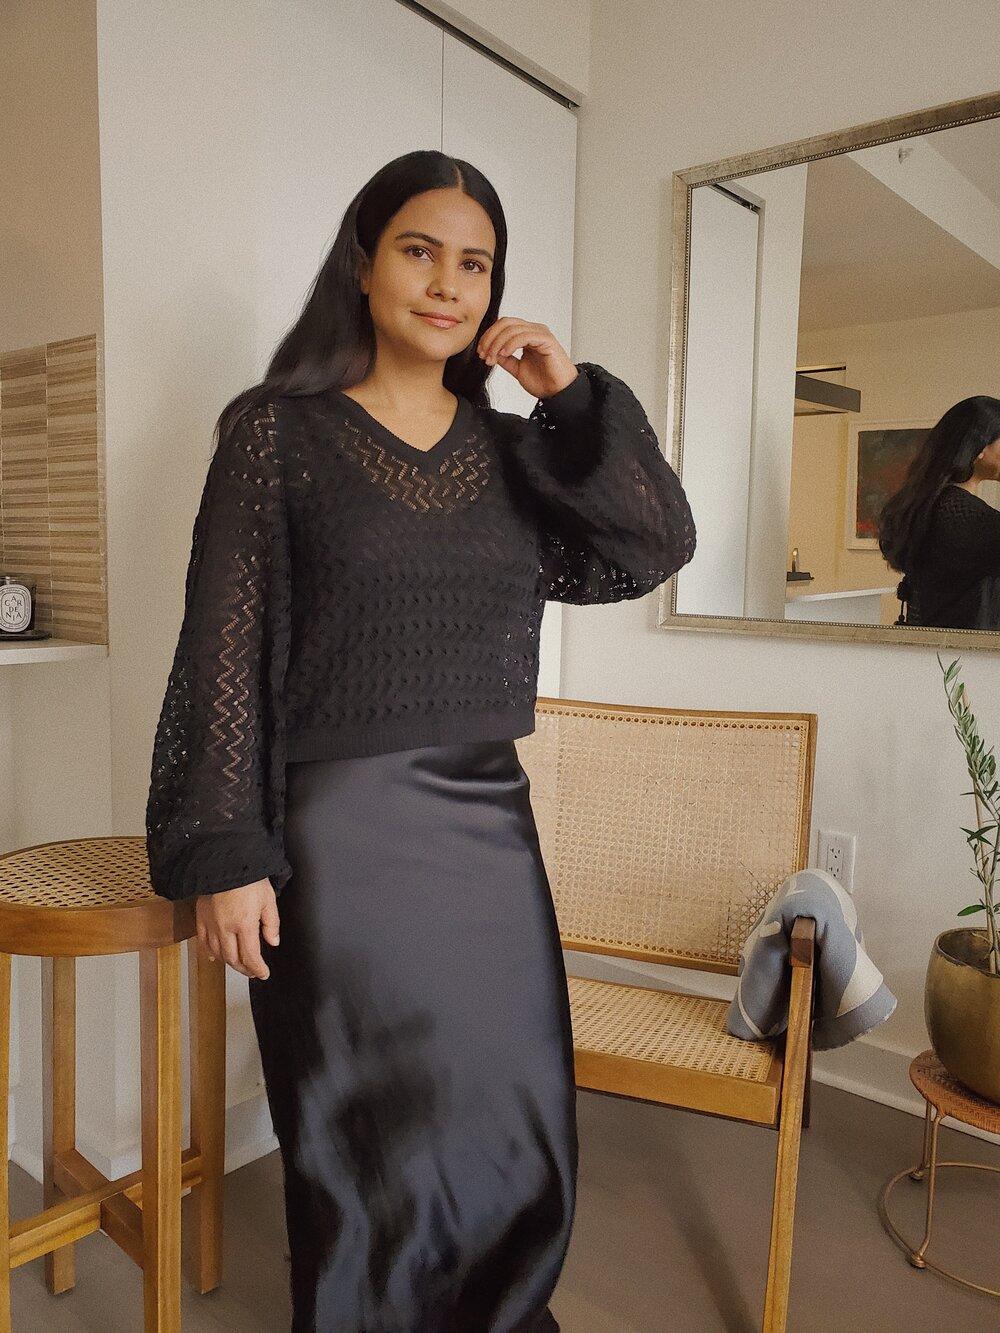 The TARA Sweater    SHOP HERE  + Shalini's own slip-dress